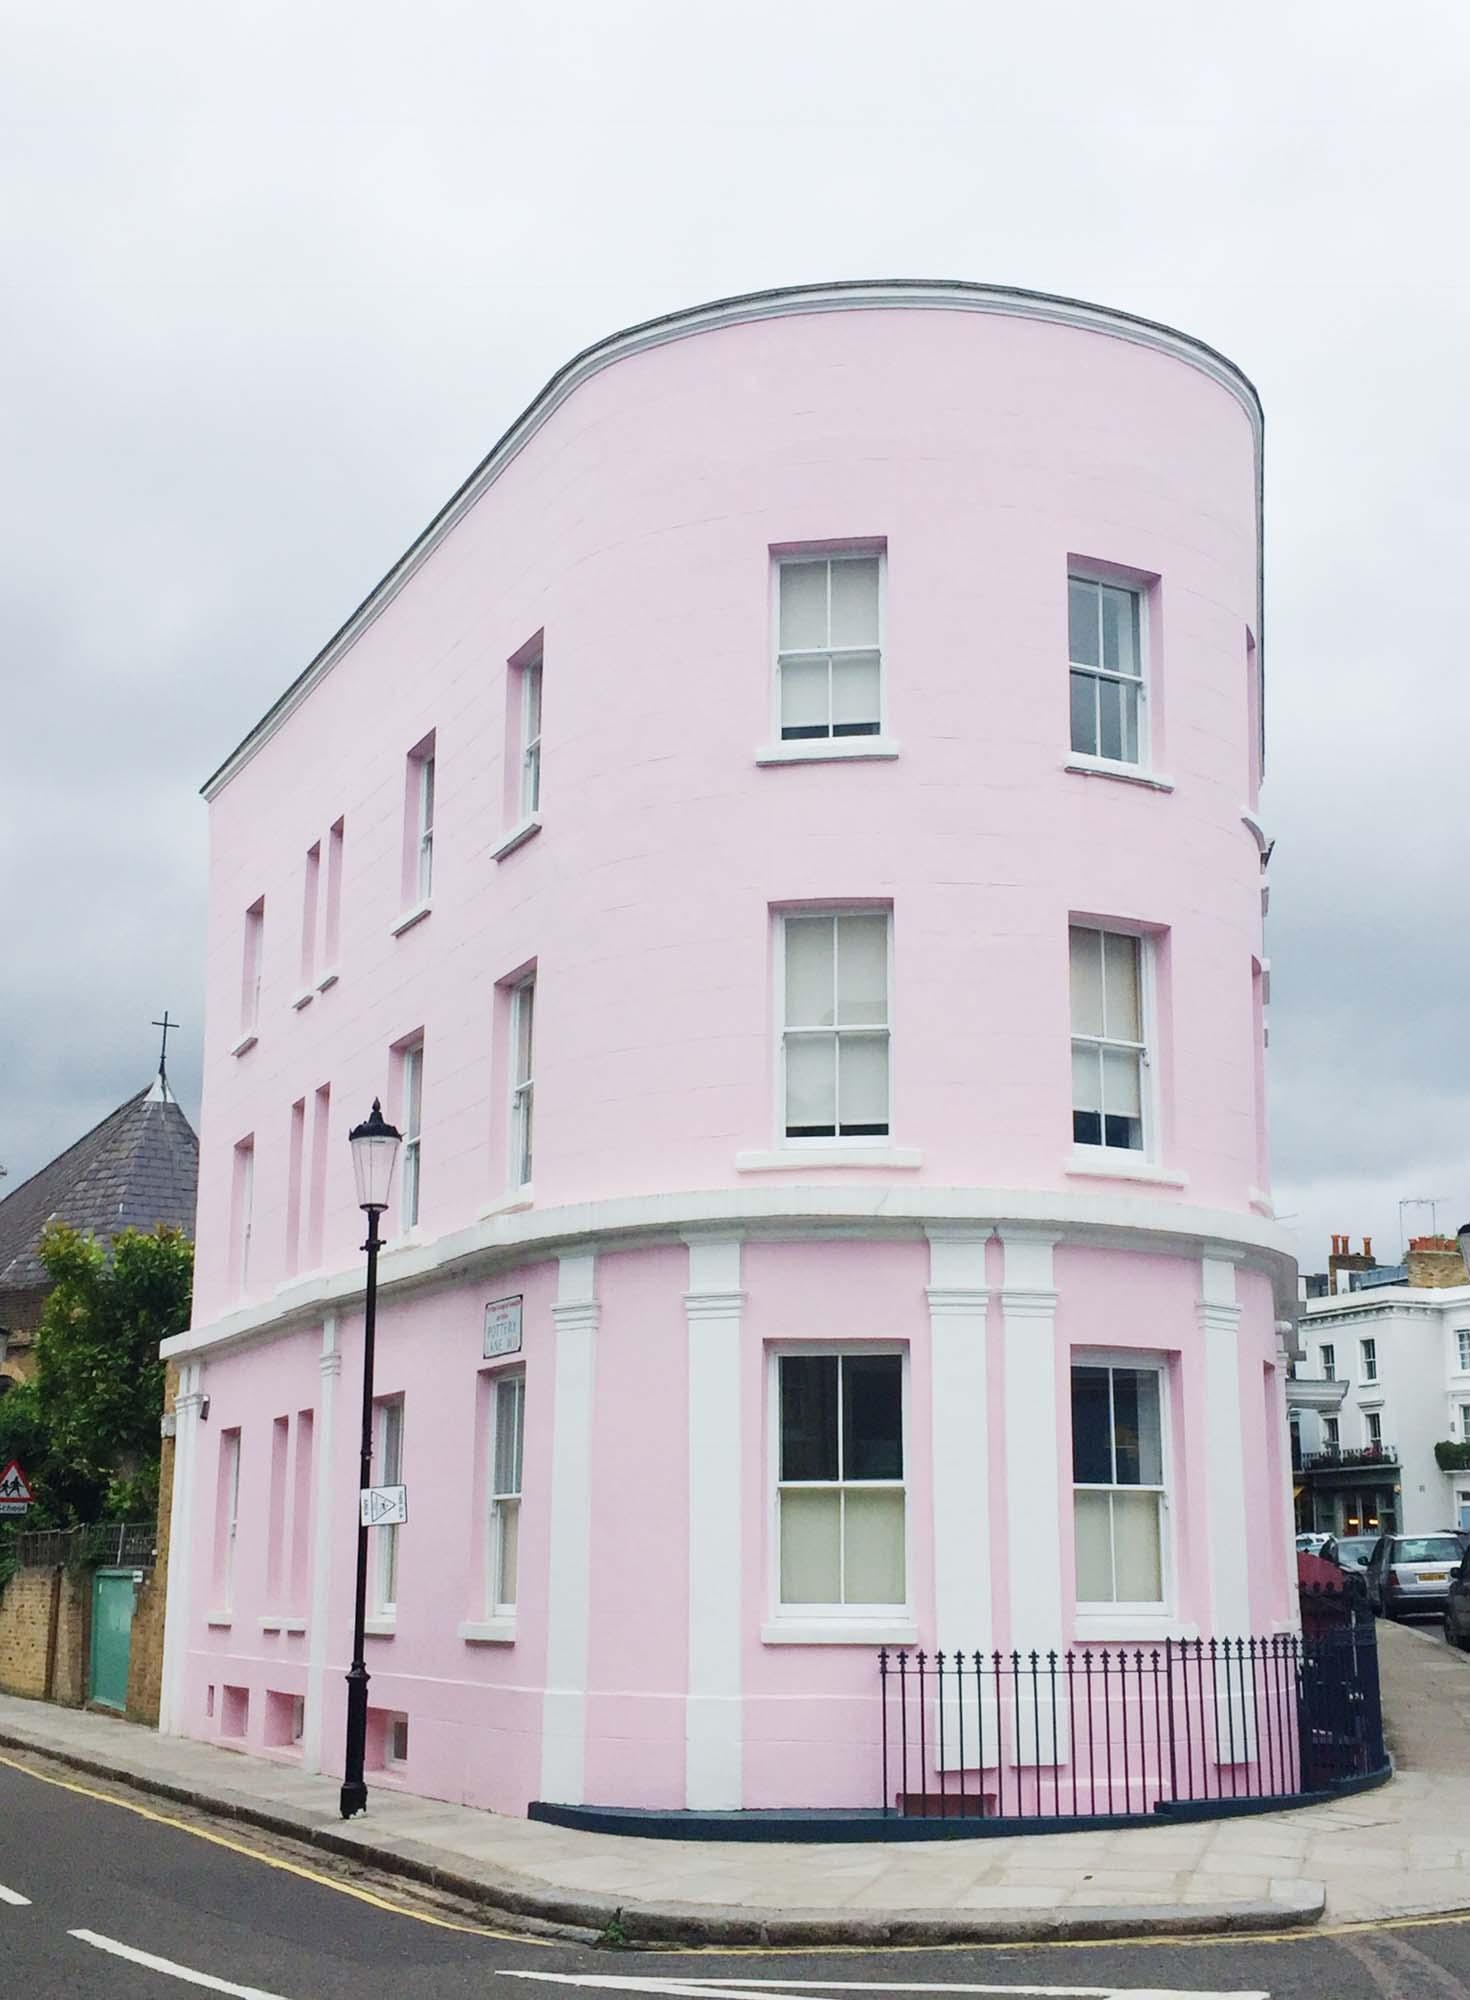 Julie's favourite pink corner house in Holland Park/Photo: @londonispink